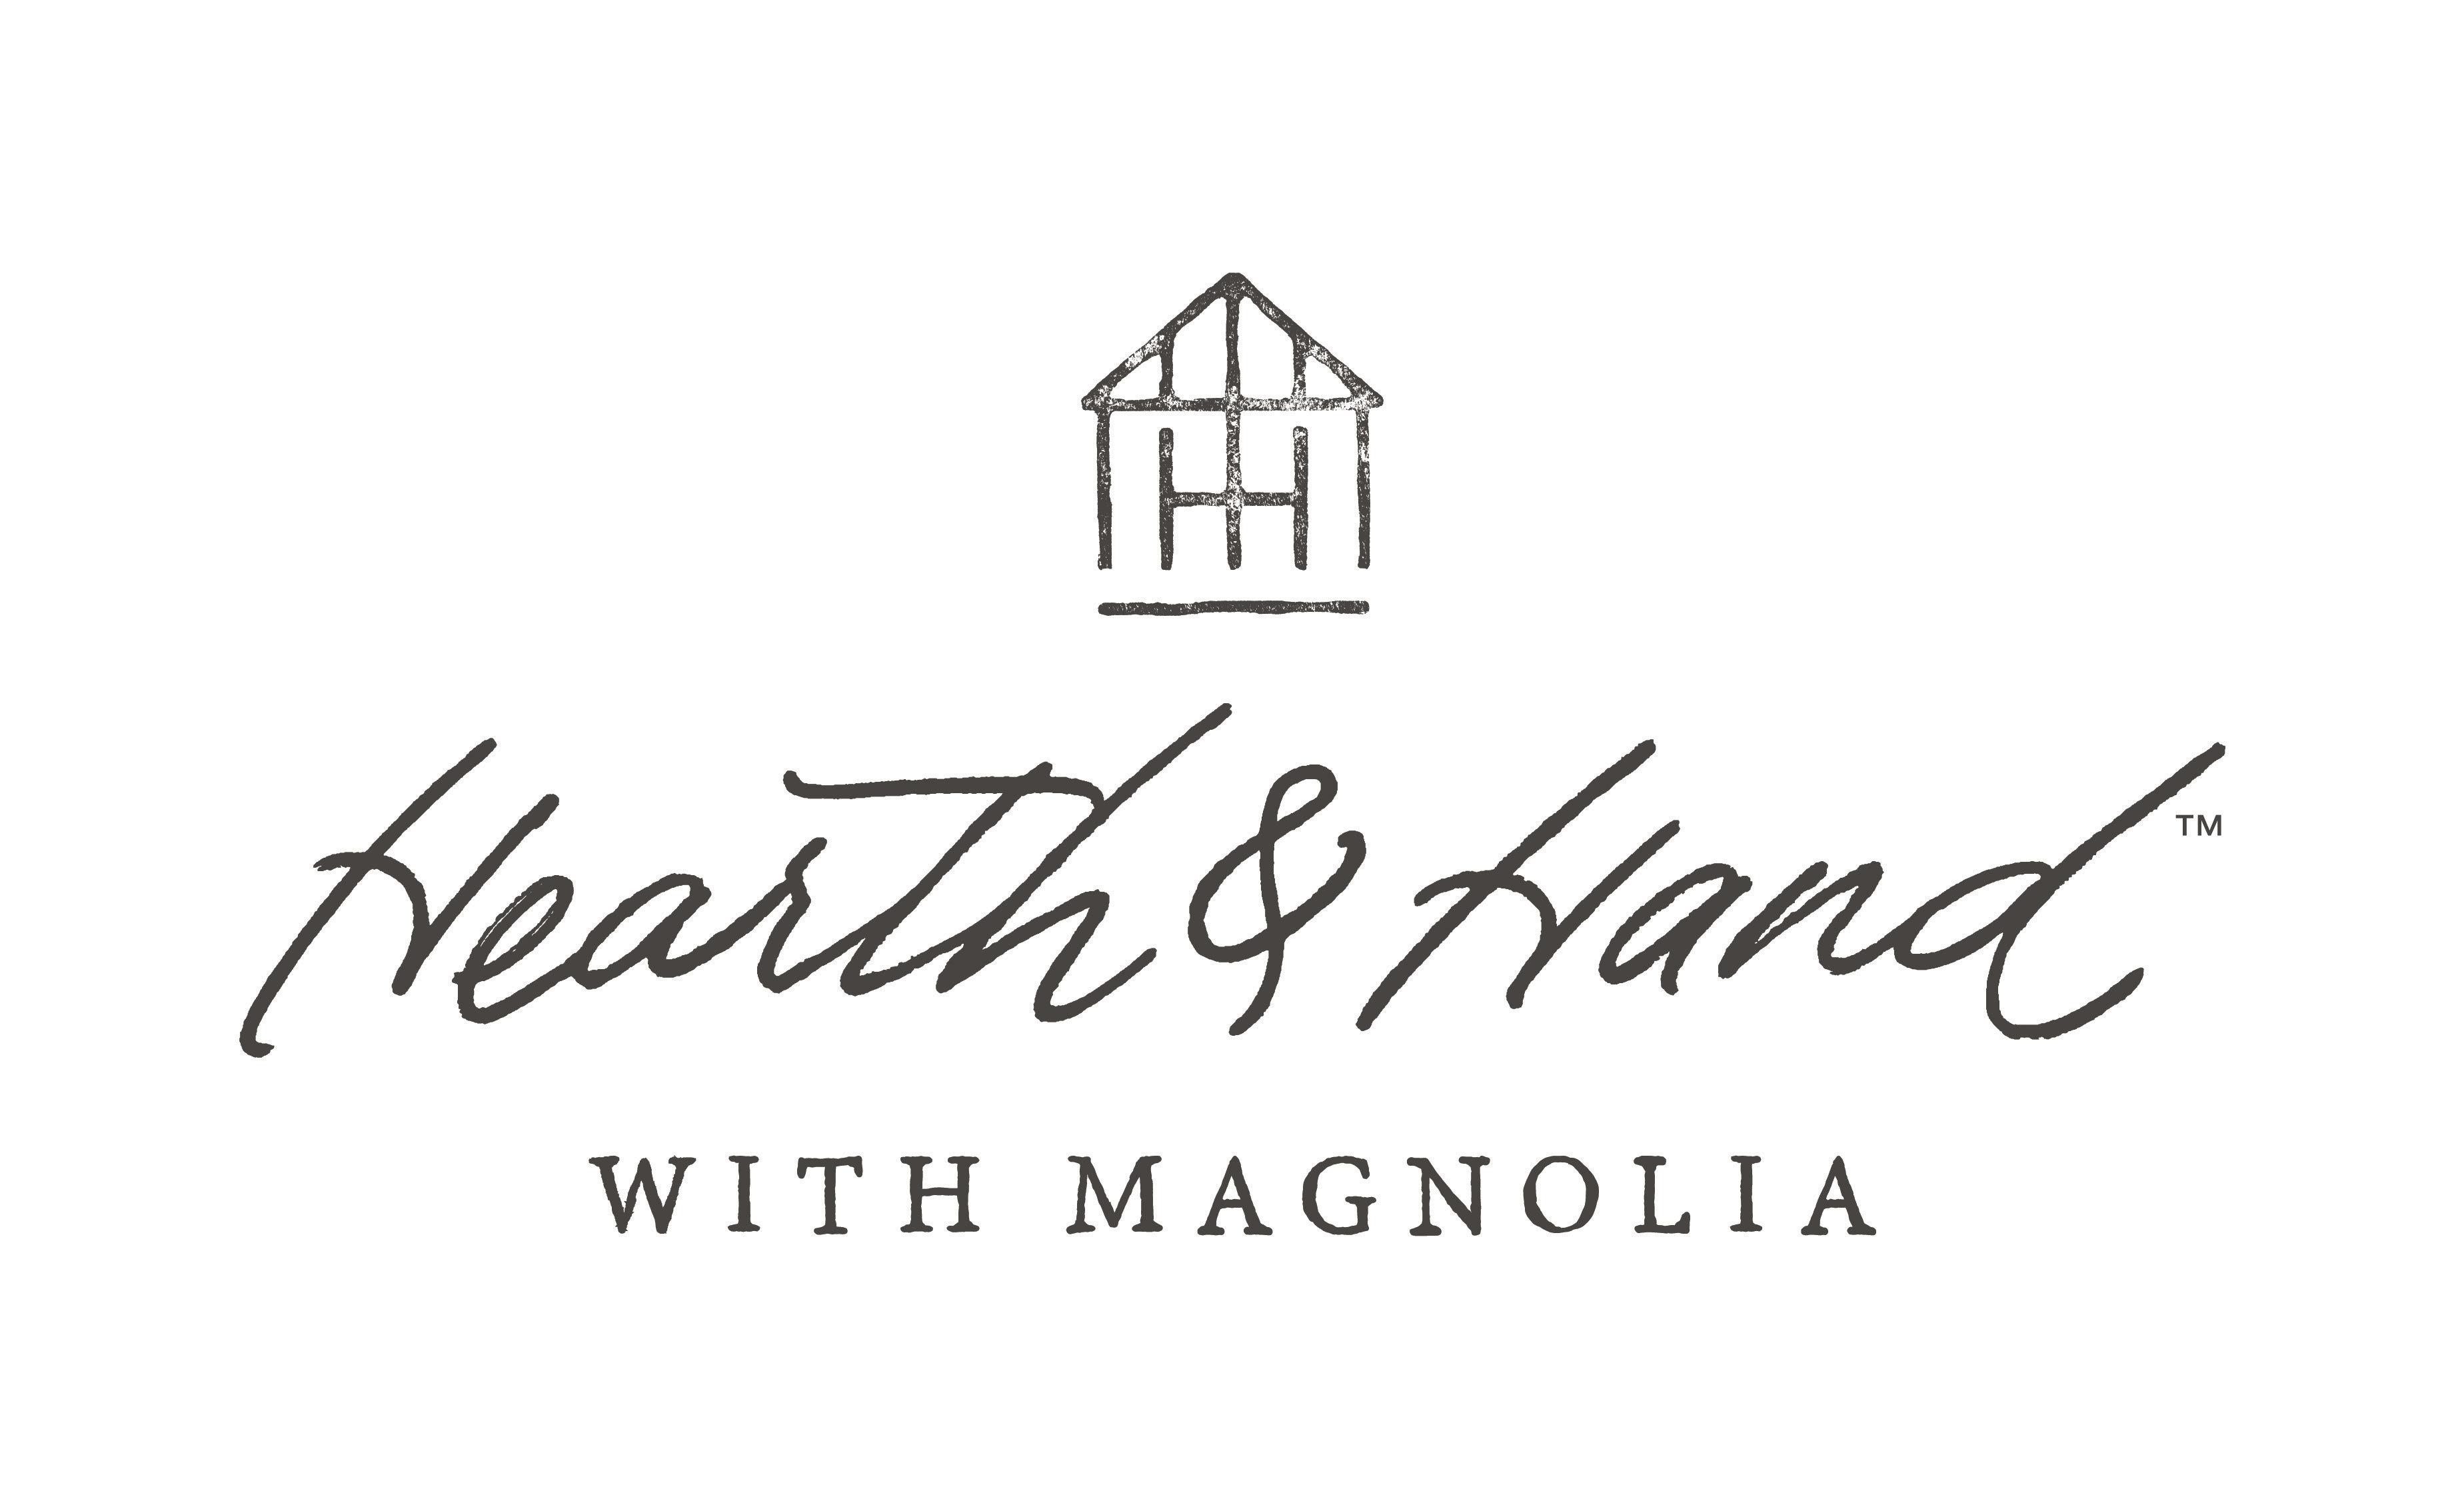 target announces hearth  u0026 hand with magnolia  a